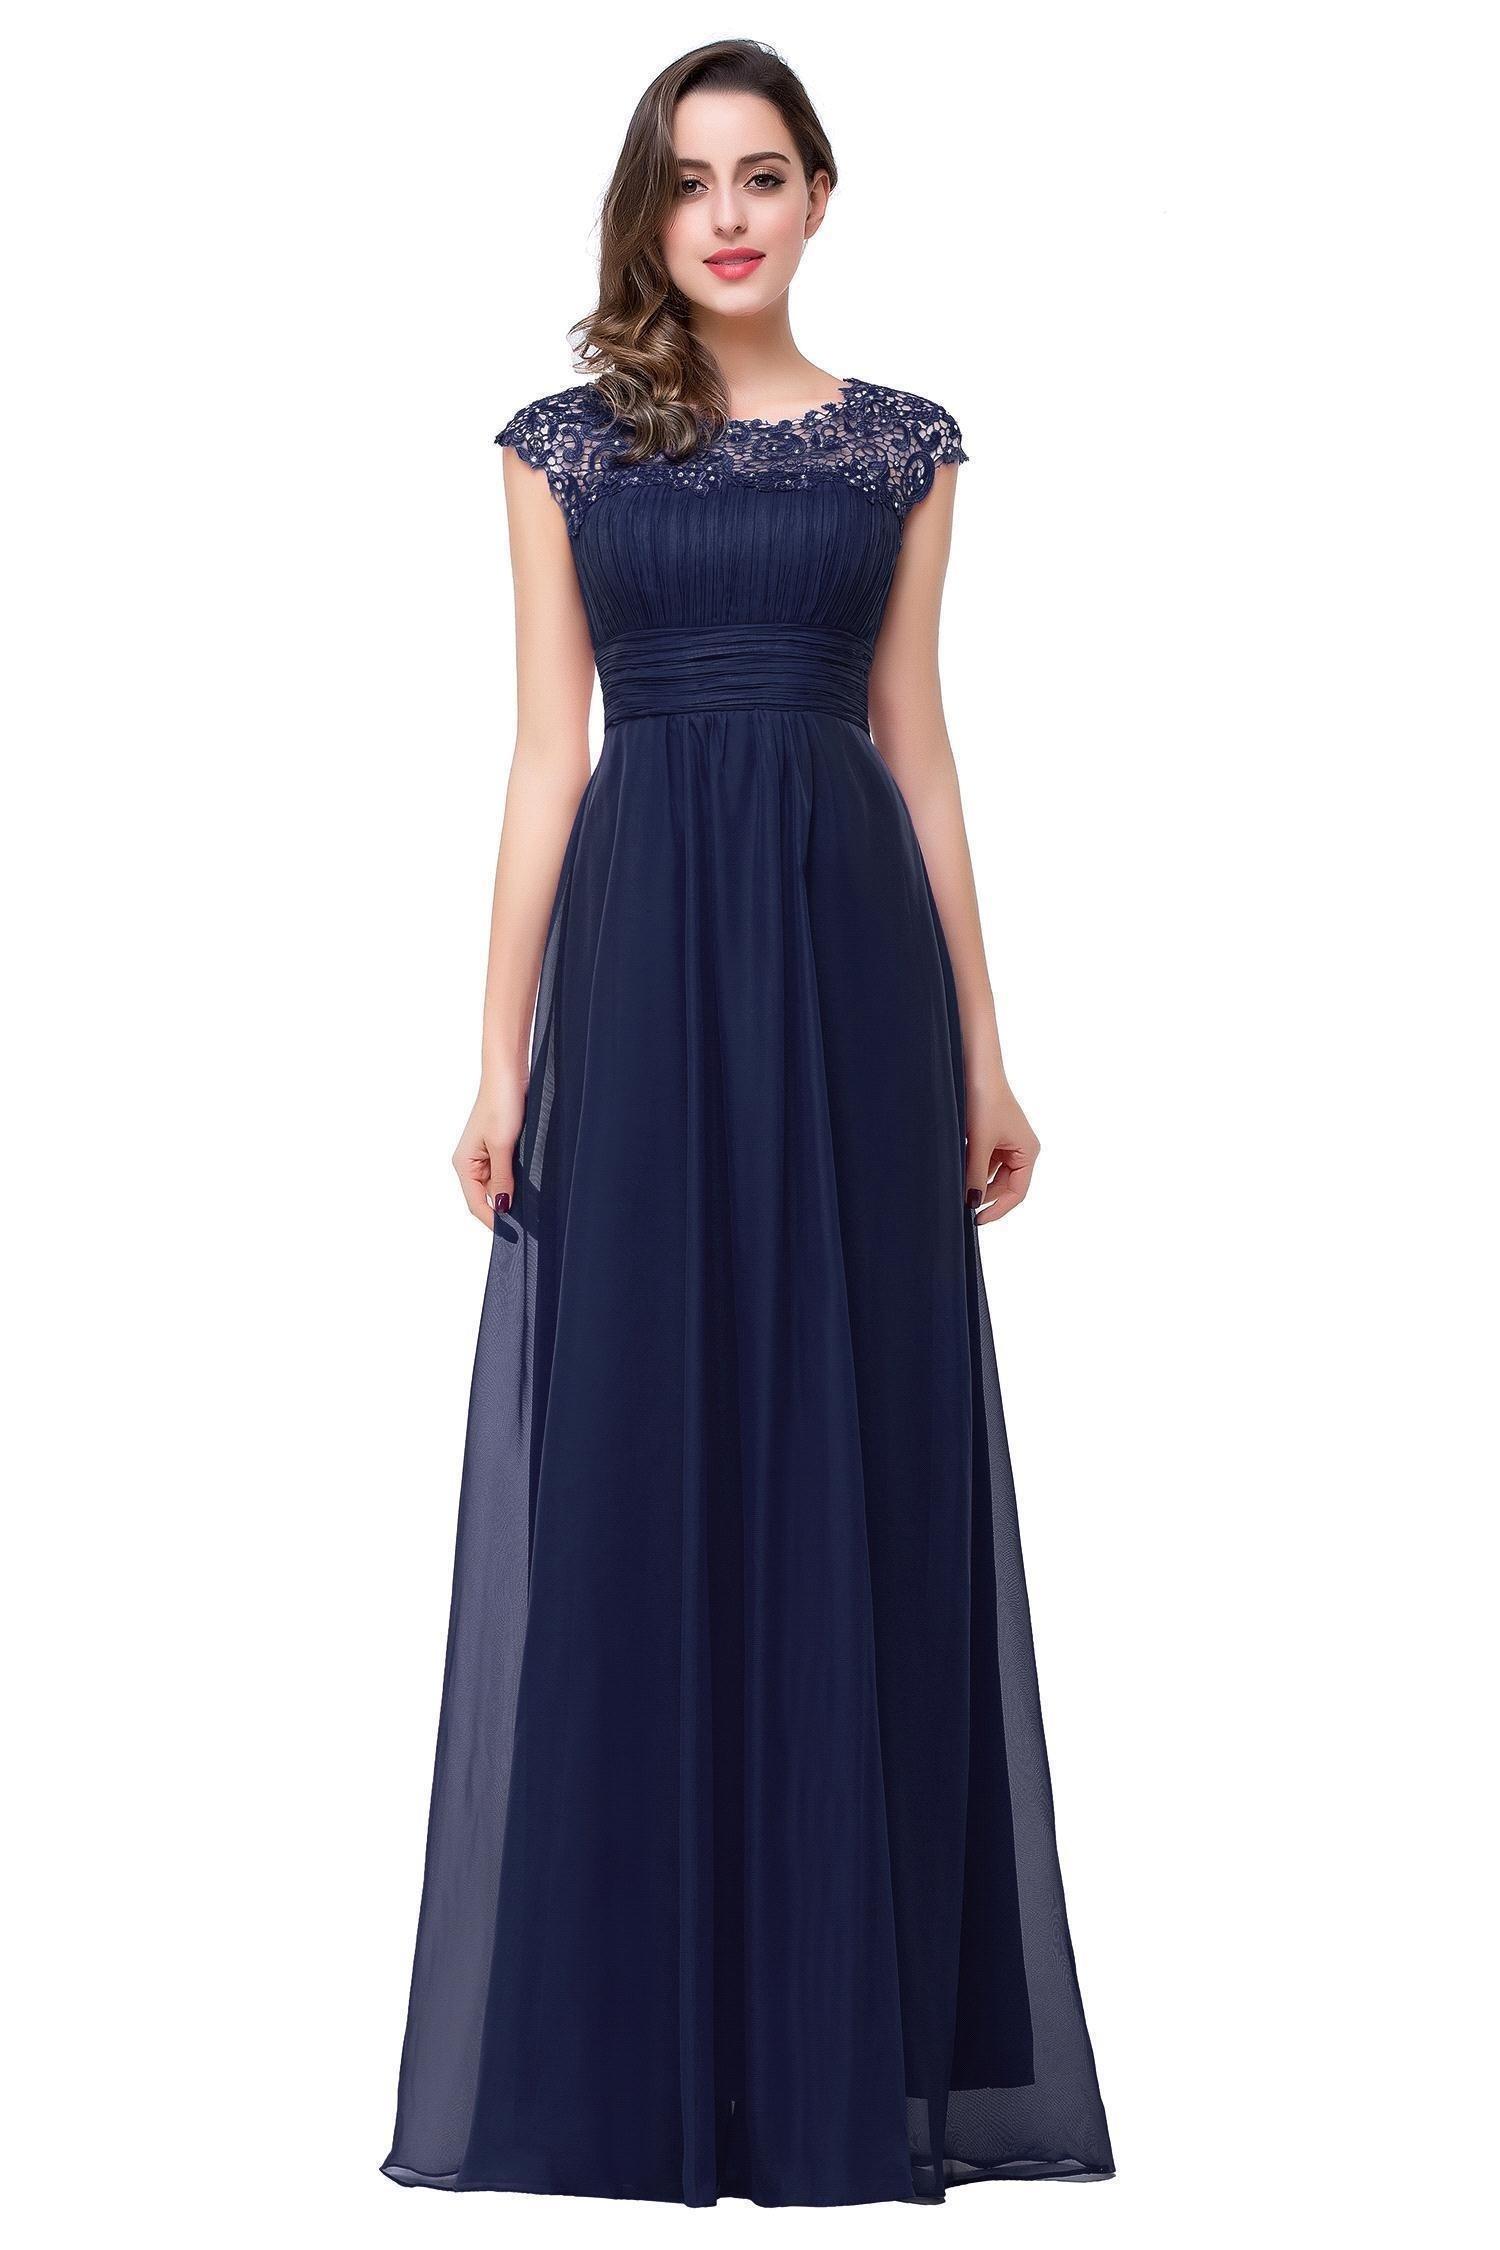 20 Luxurius Kleid Lang Spitze Bester Preis20 Einzigartig Kleid Lang Spitze Galerie